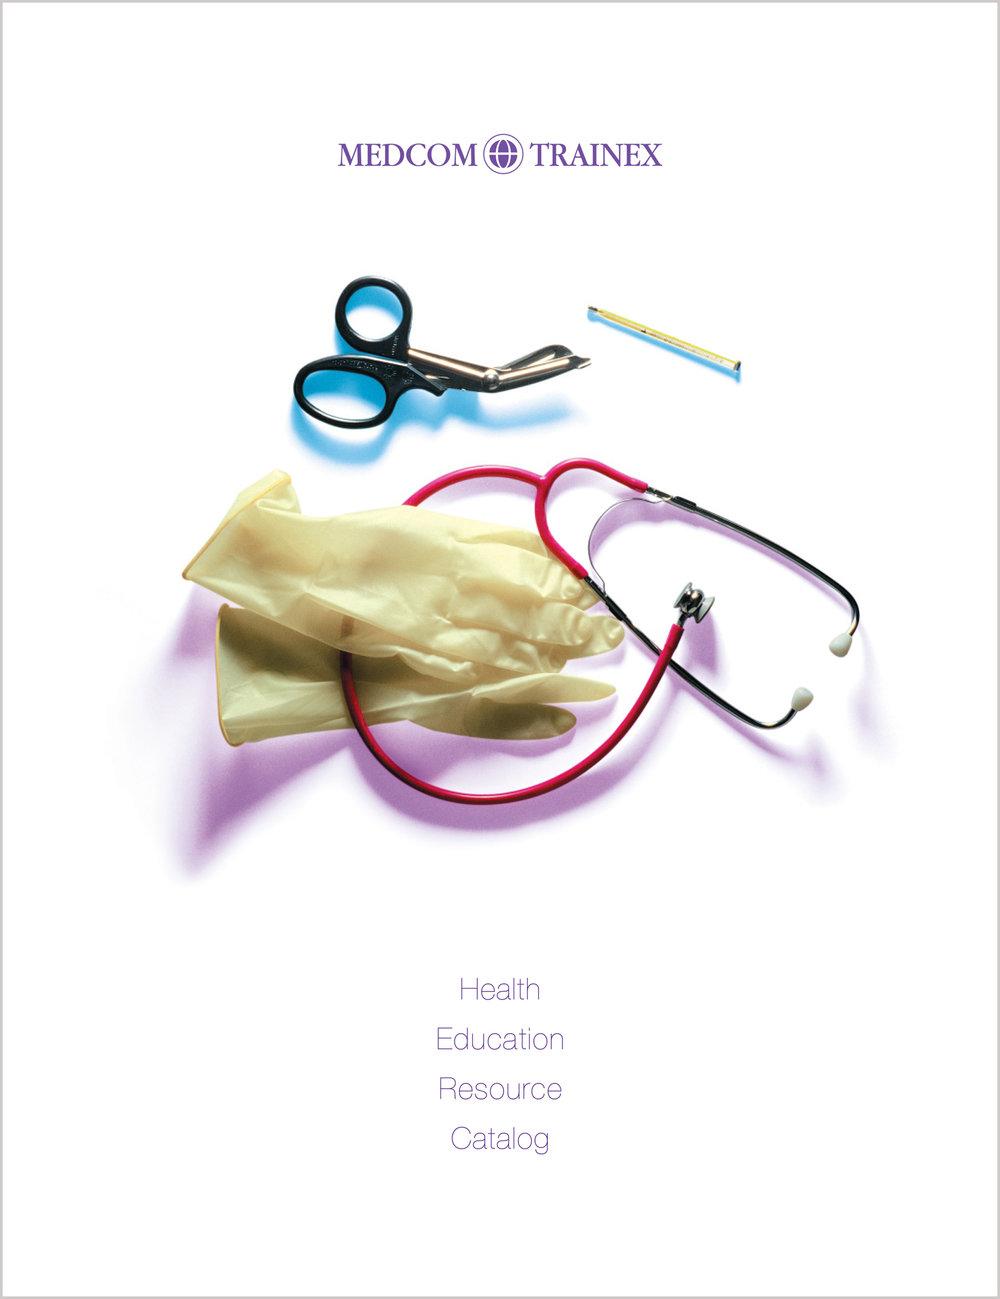 MedcomCatCvrWht.jpg